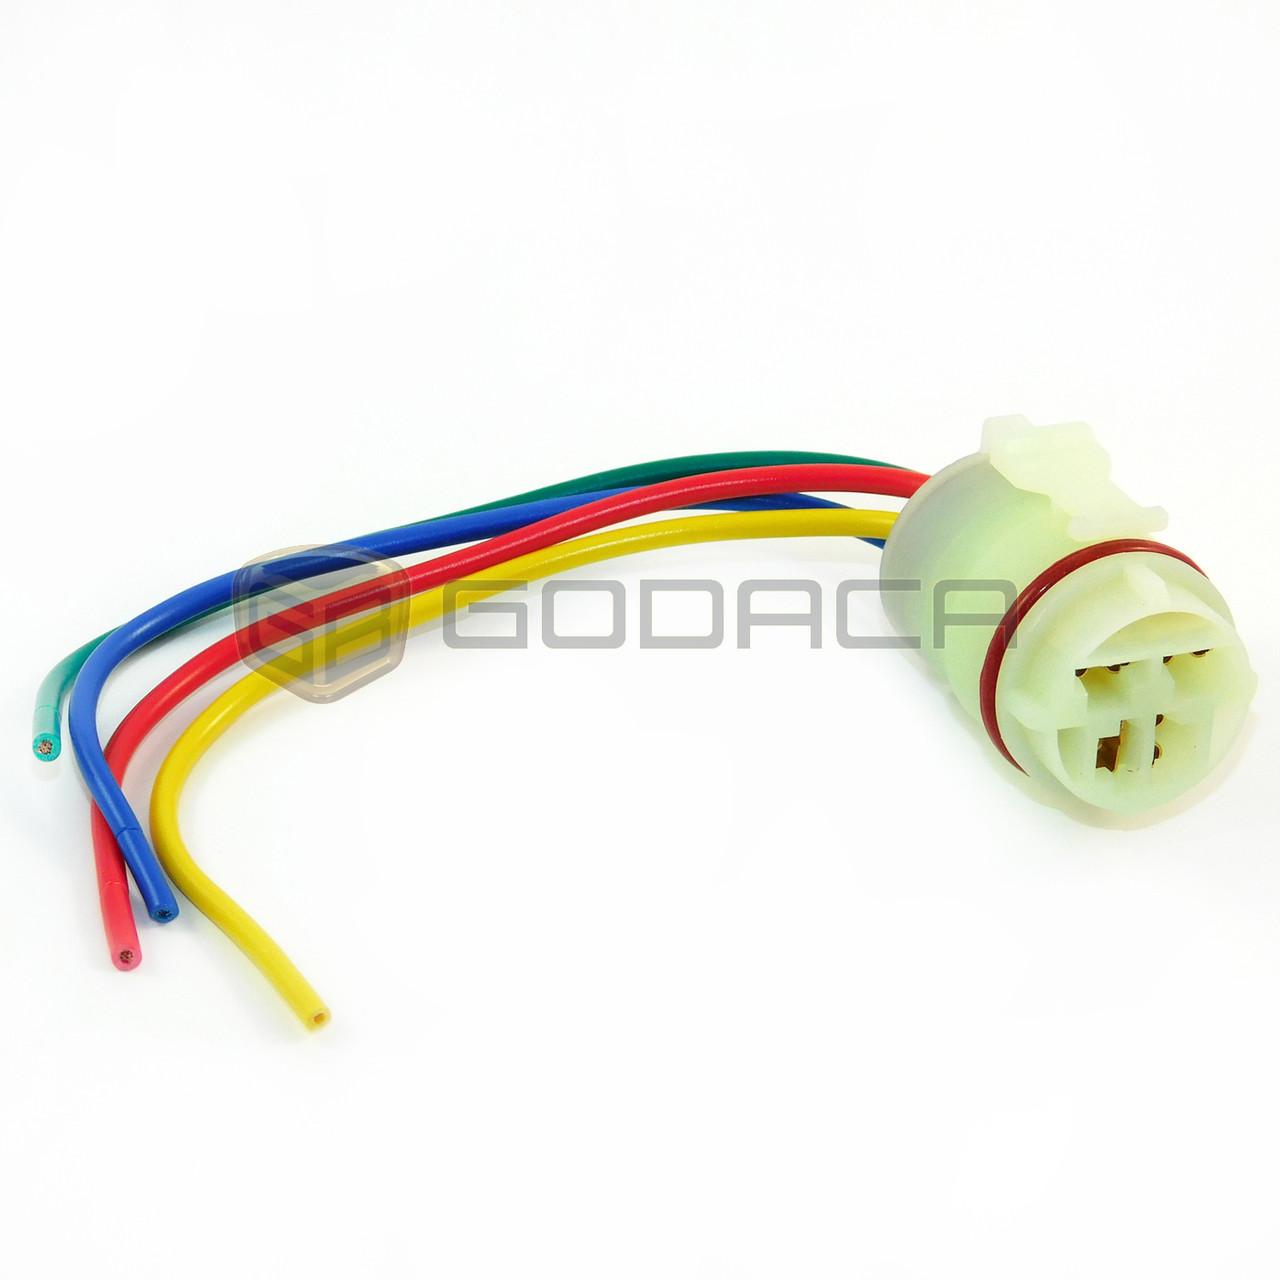 small resolution of 1 x 4 way connector alternator repair plug harness universal for gm chevrolet godaca llc